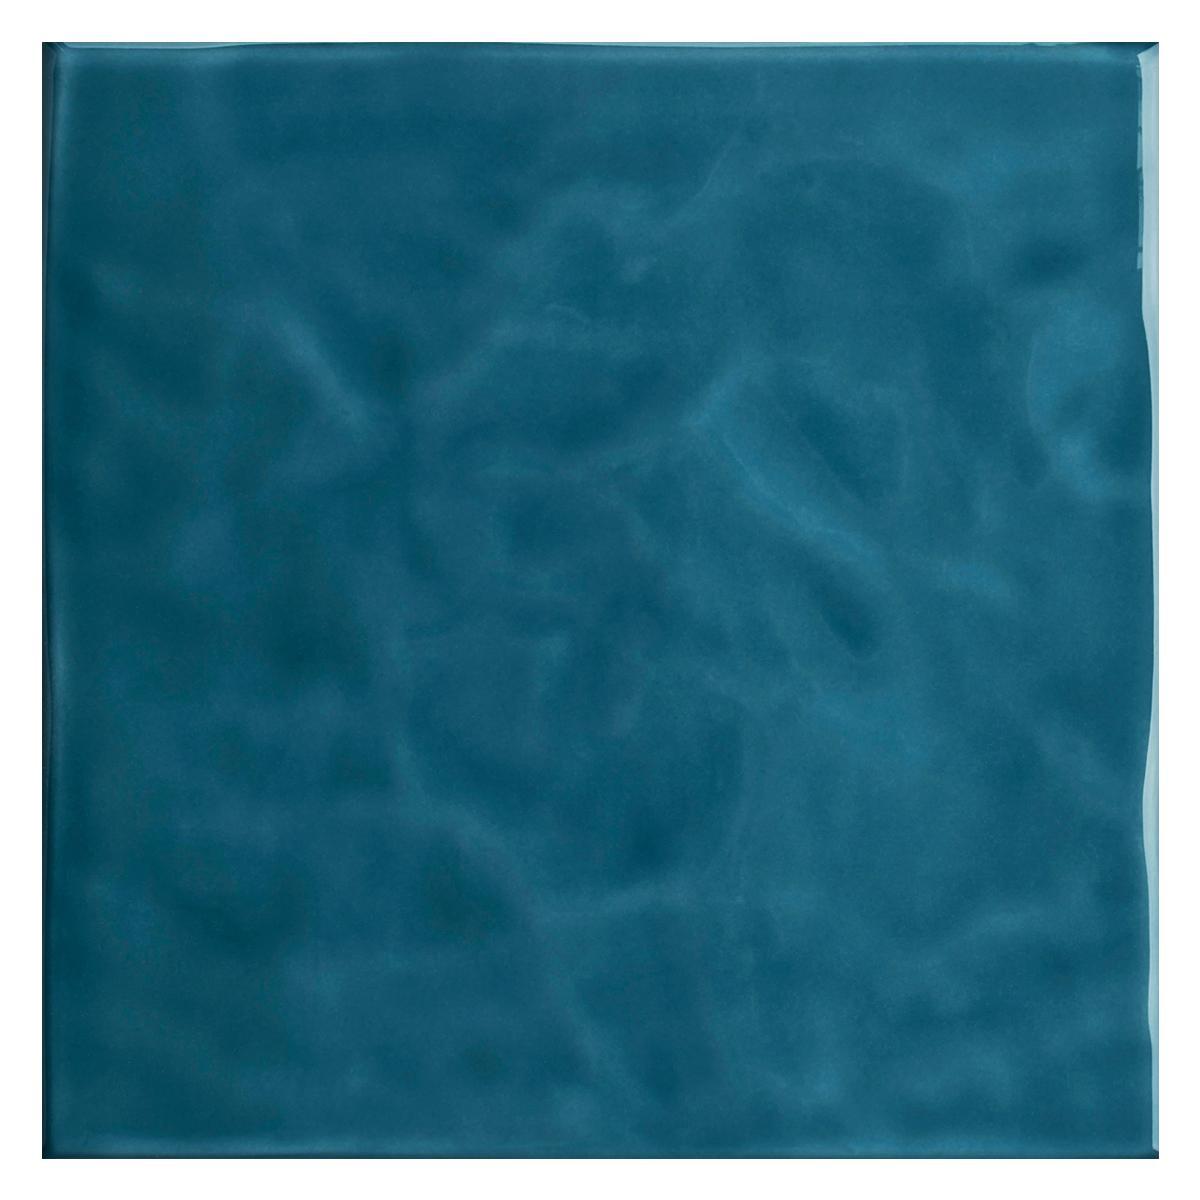 Mayólica Mar Azul Brillante - 20X20 cm - 1.48 m2